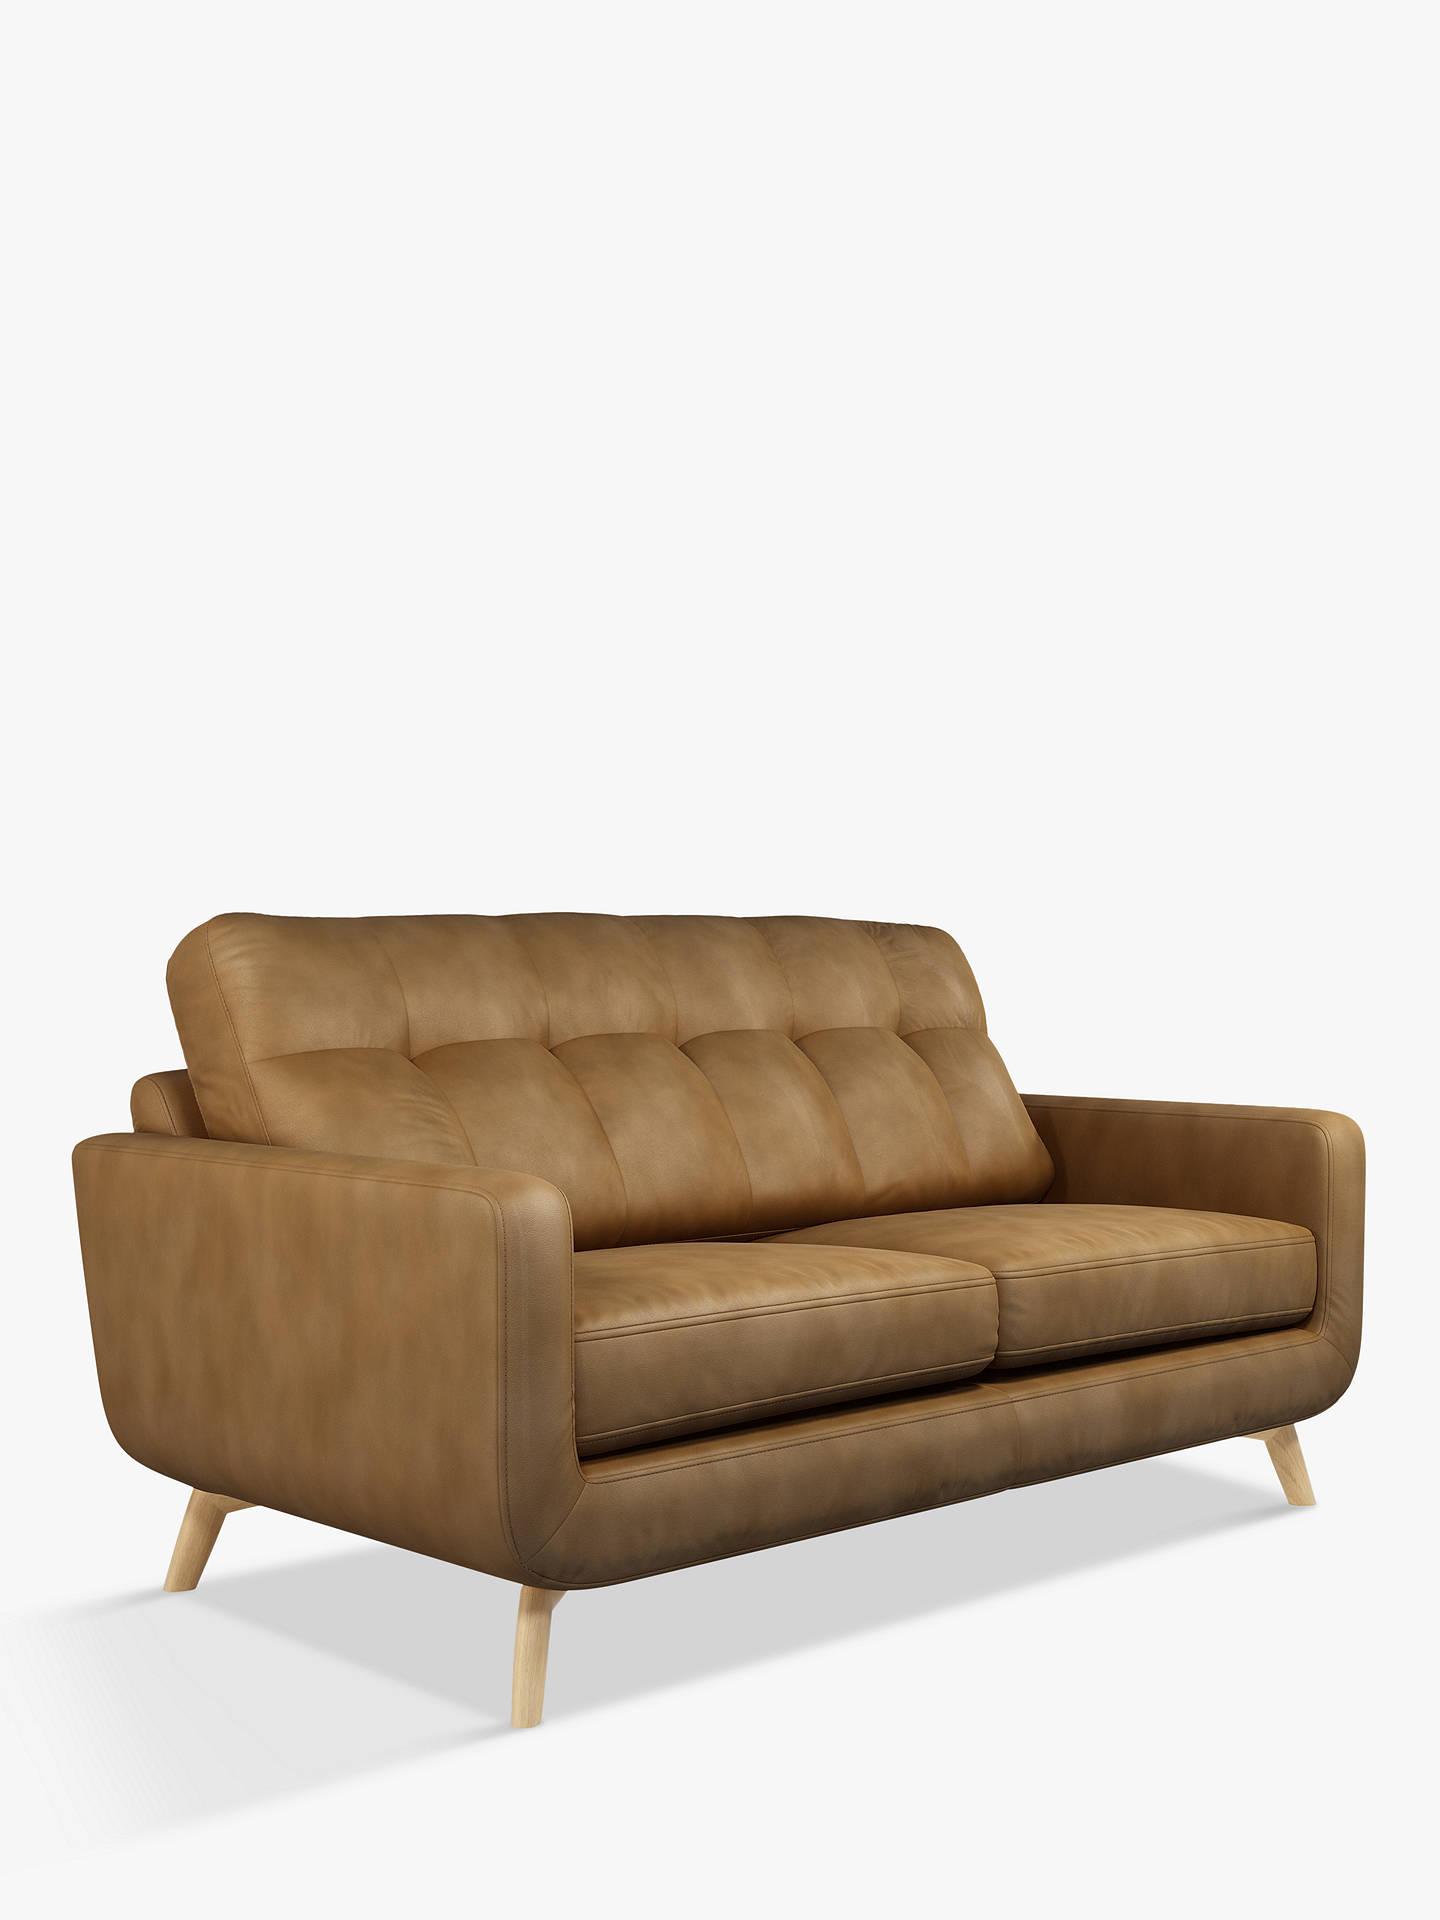 John Lewis Partners Barbican Medium 2 Seater Leather Sofa Light Leg Demetra Light Tan